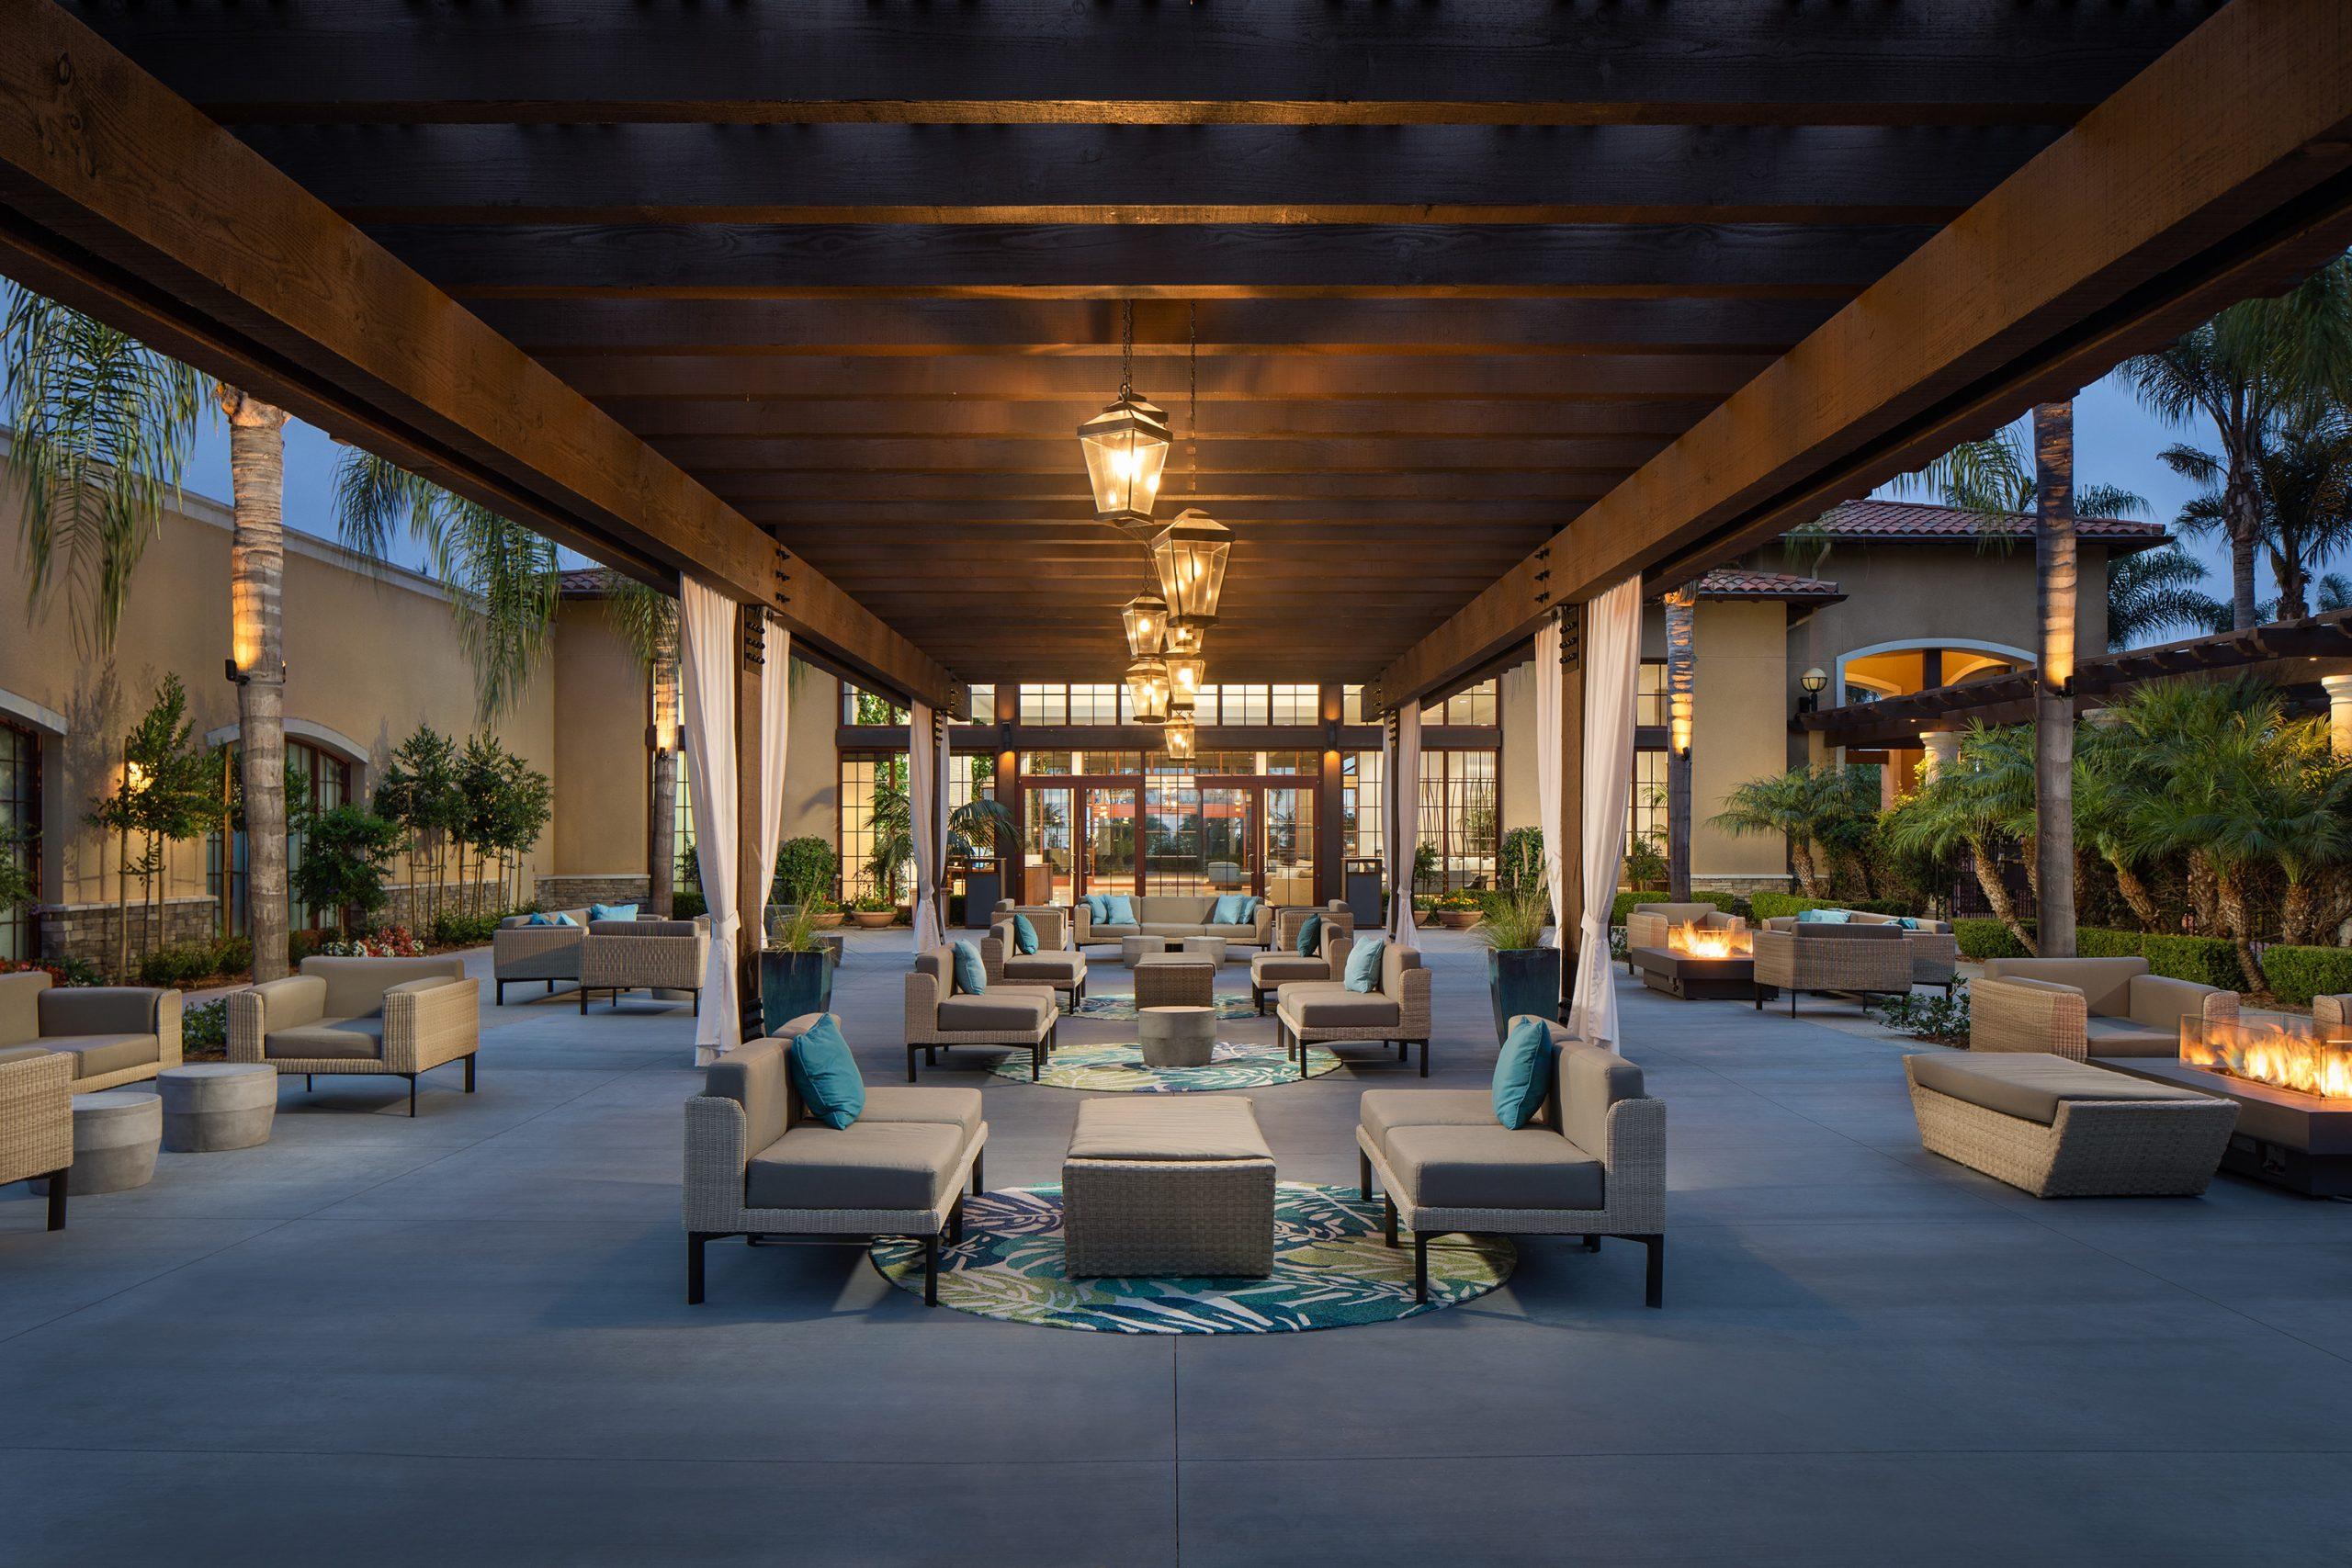 Westin Carlsbad Resort & Spa - Palm Courtyard Seating